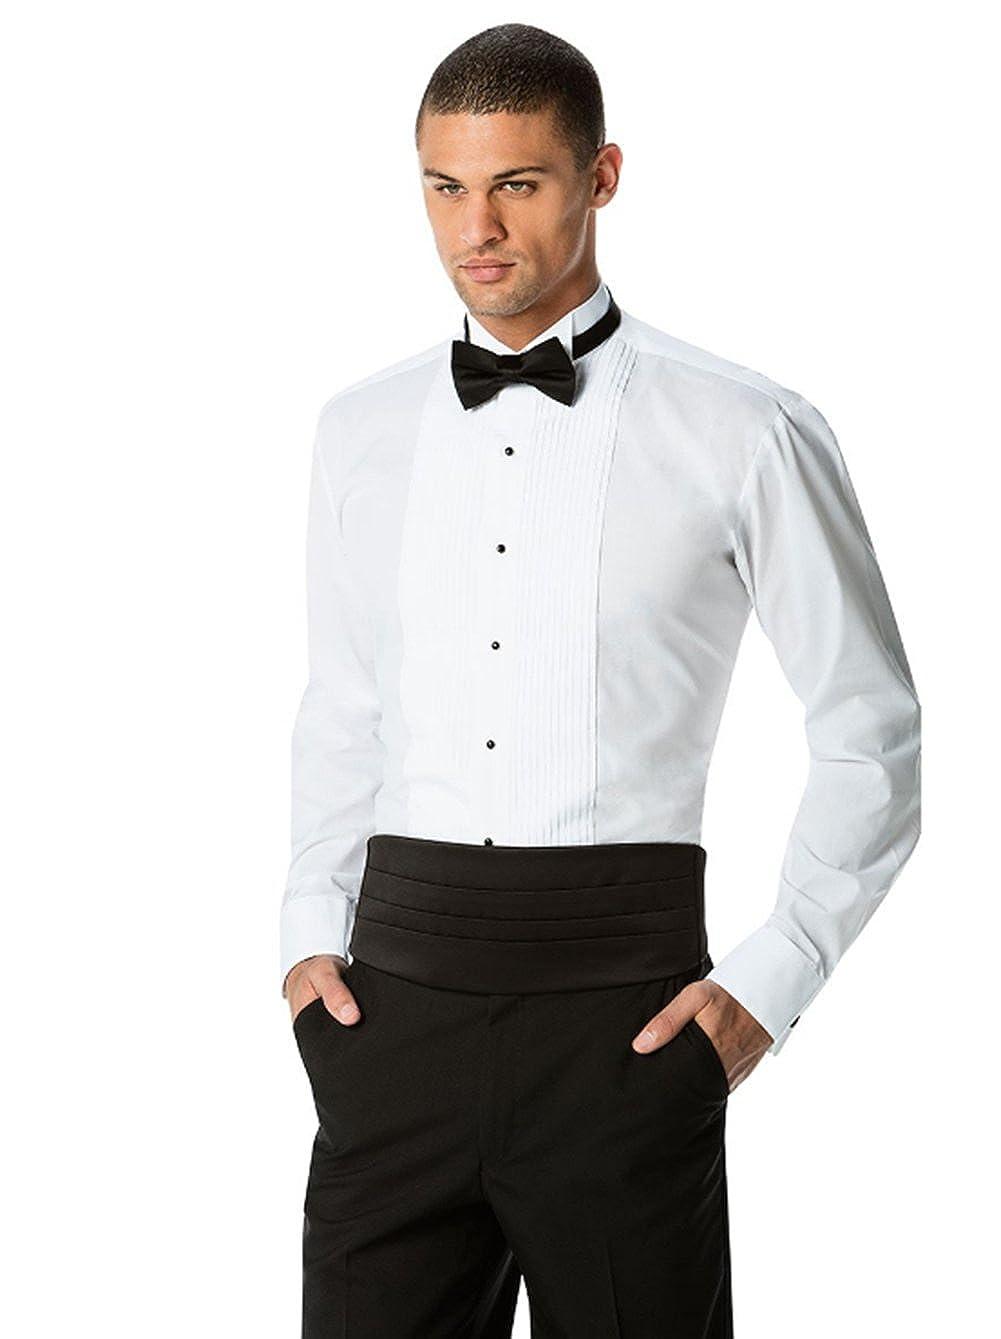 Neil Allyn Mens Tuxedo Shirt 100/% Cotton 1//4 Pleat Wing Collar